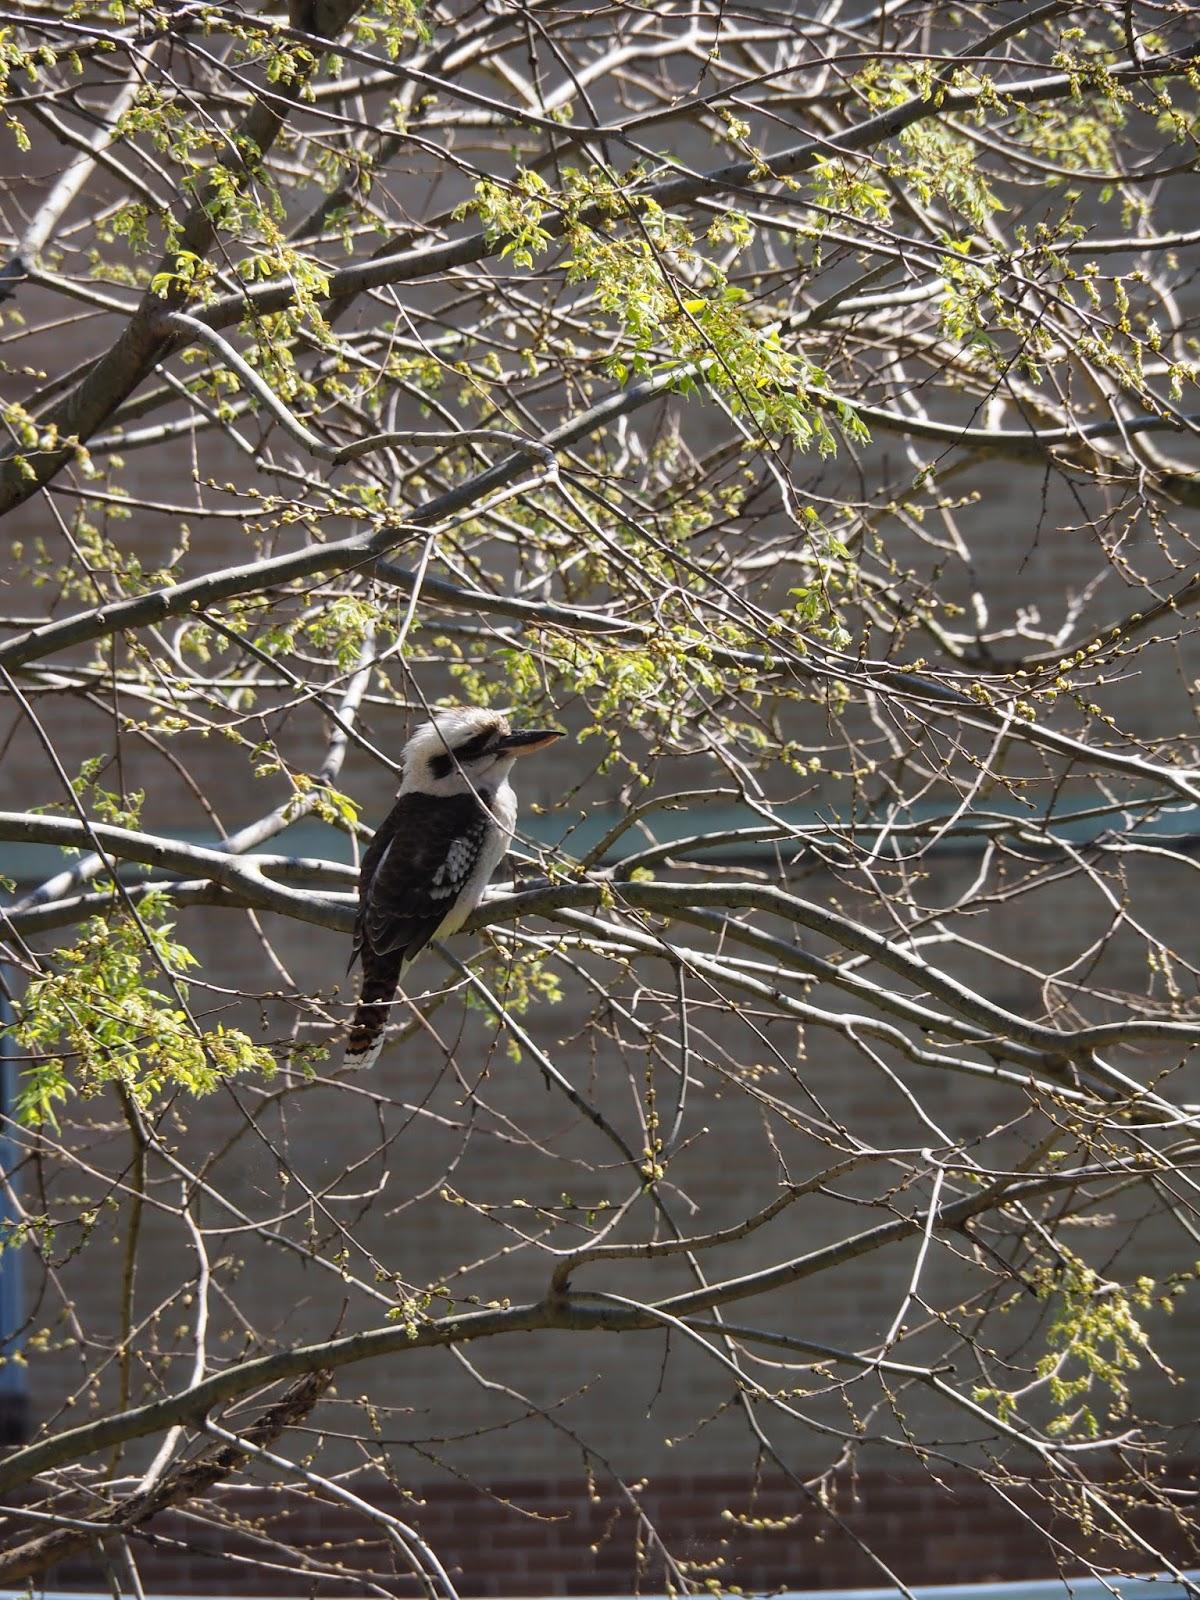 Kookaburra Sydney